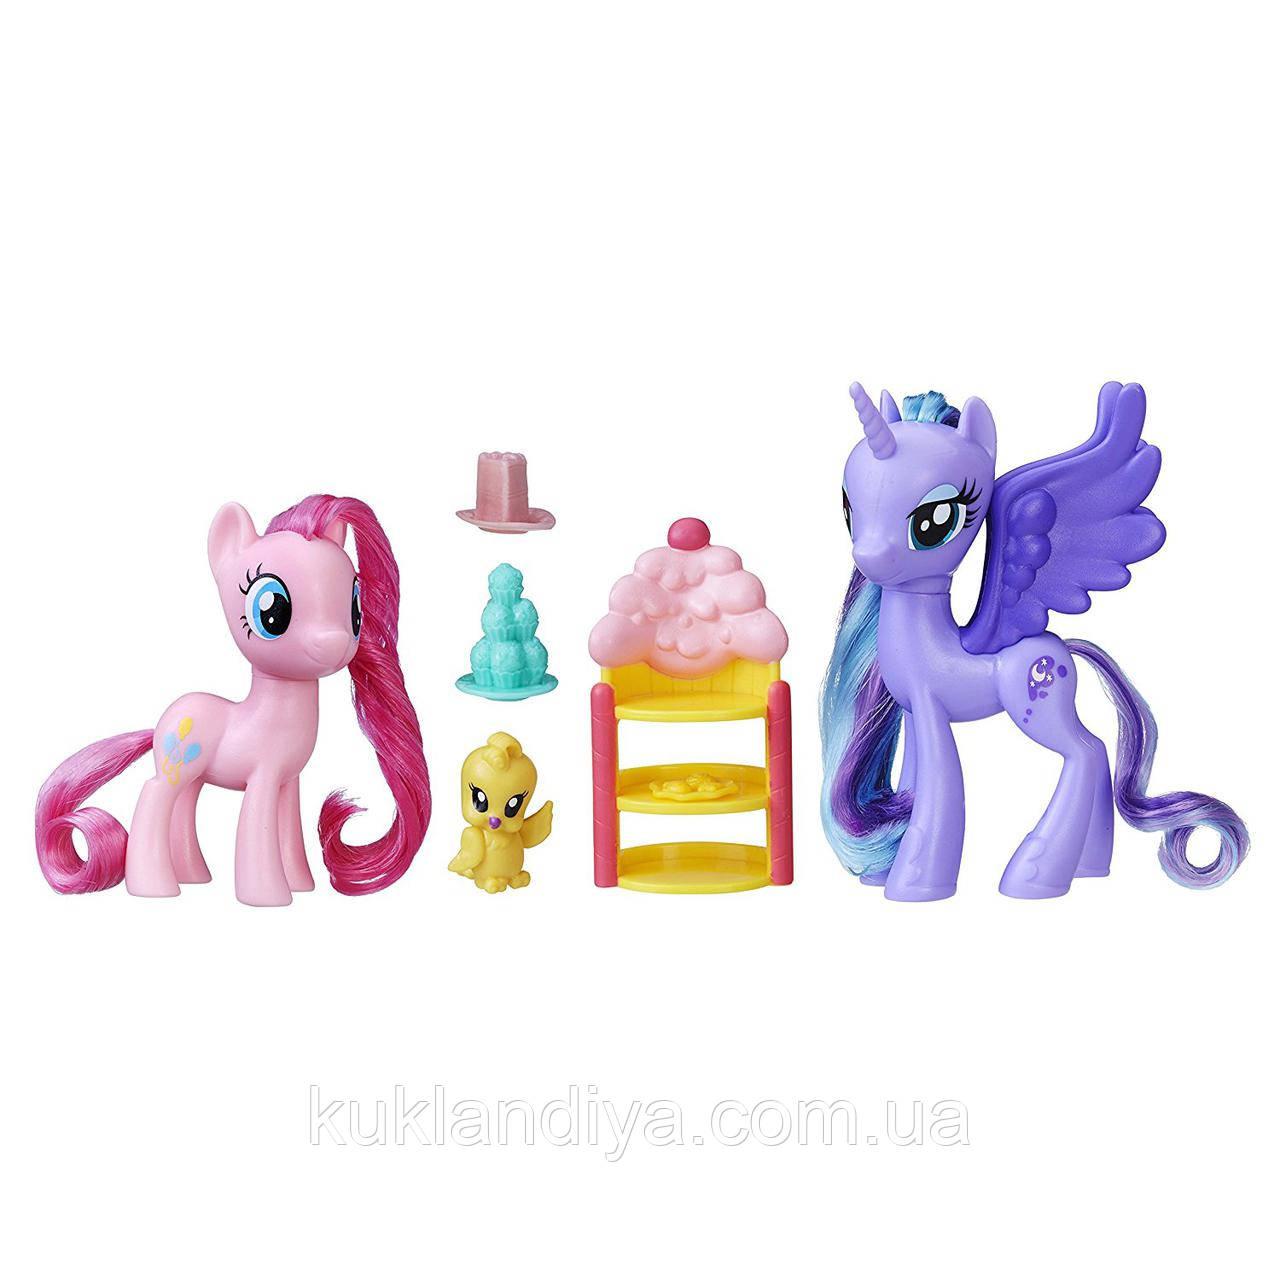 Набор My Little Pony Принцесса Луна и Пинки Пай Празднование со сладостями